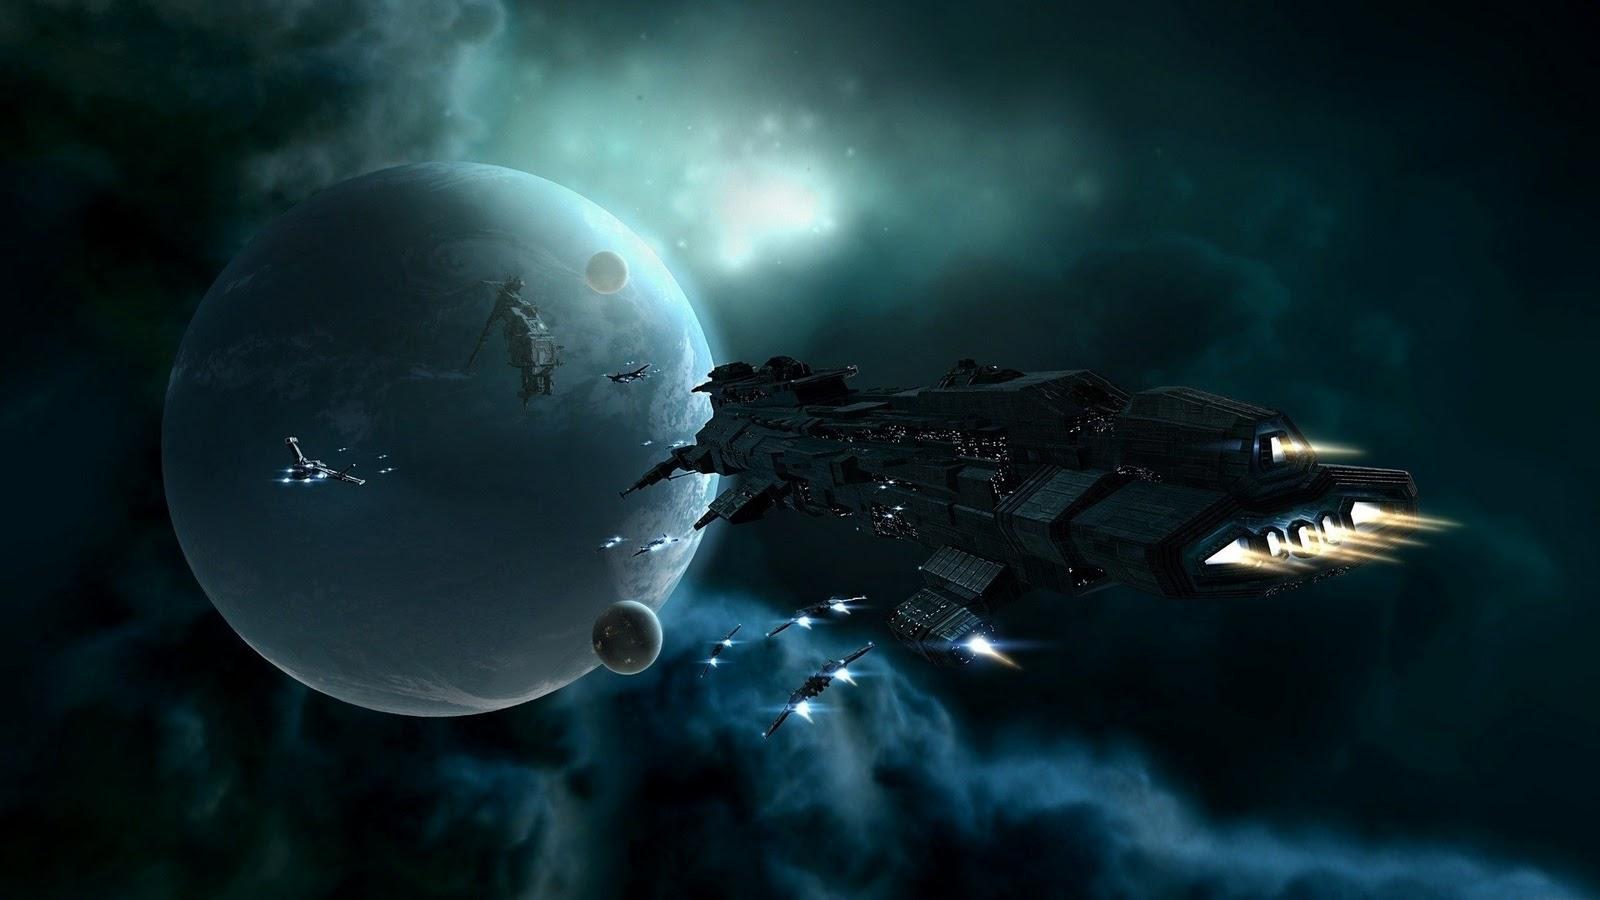 http://2.bp.blogspot.com/-4scn449XK1U/TwGWTOxQhqI/AAAAAAAAAMg/cpGTTHt77ZM/s1600/Spacecraft-wallpaper.jpg